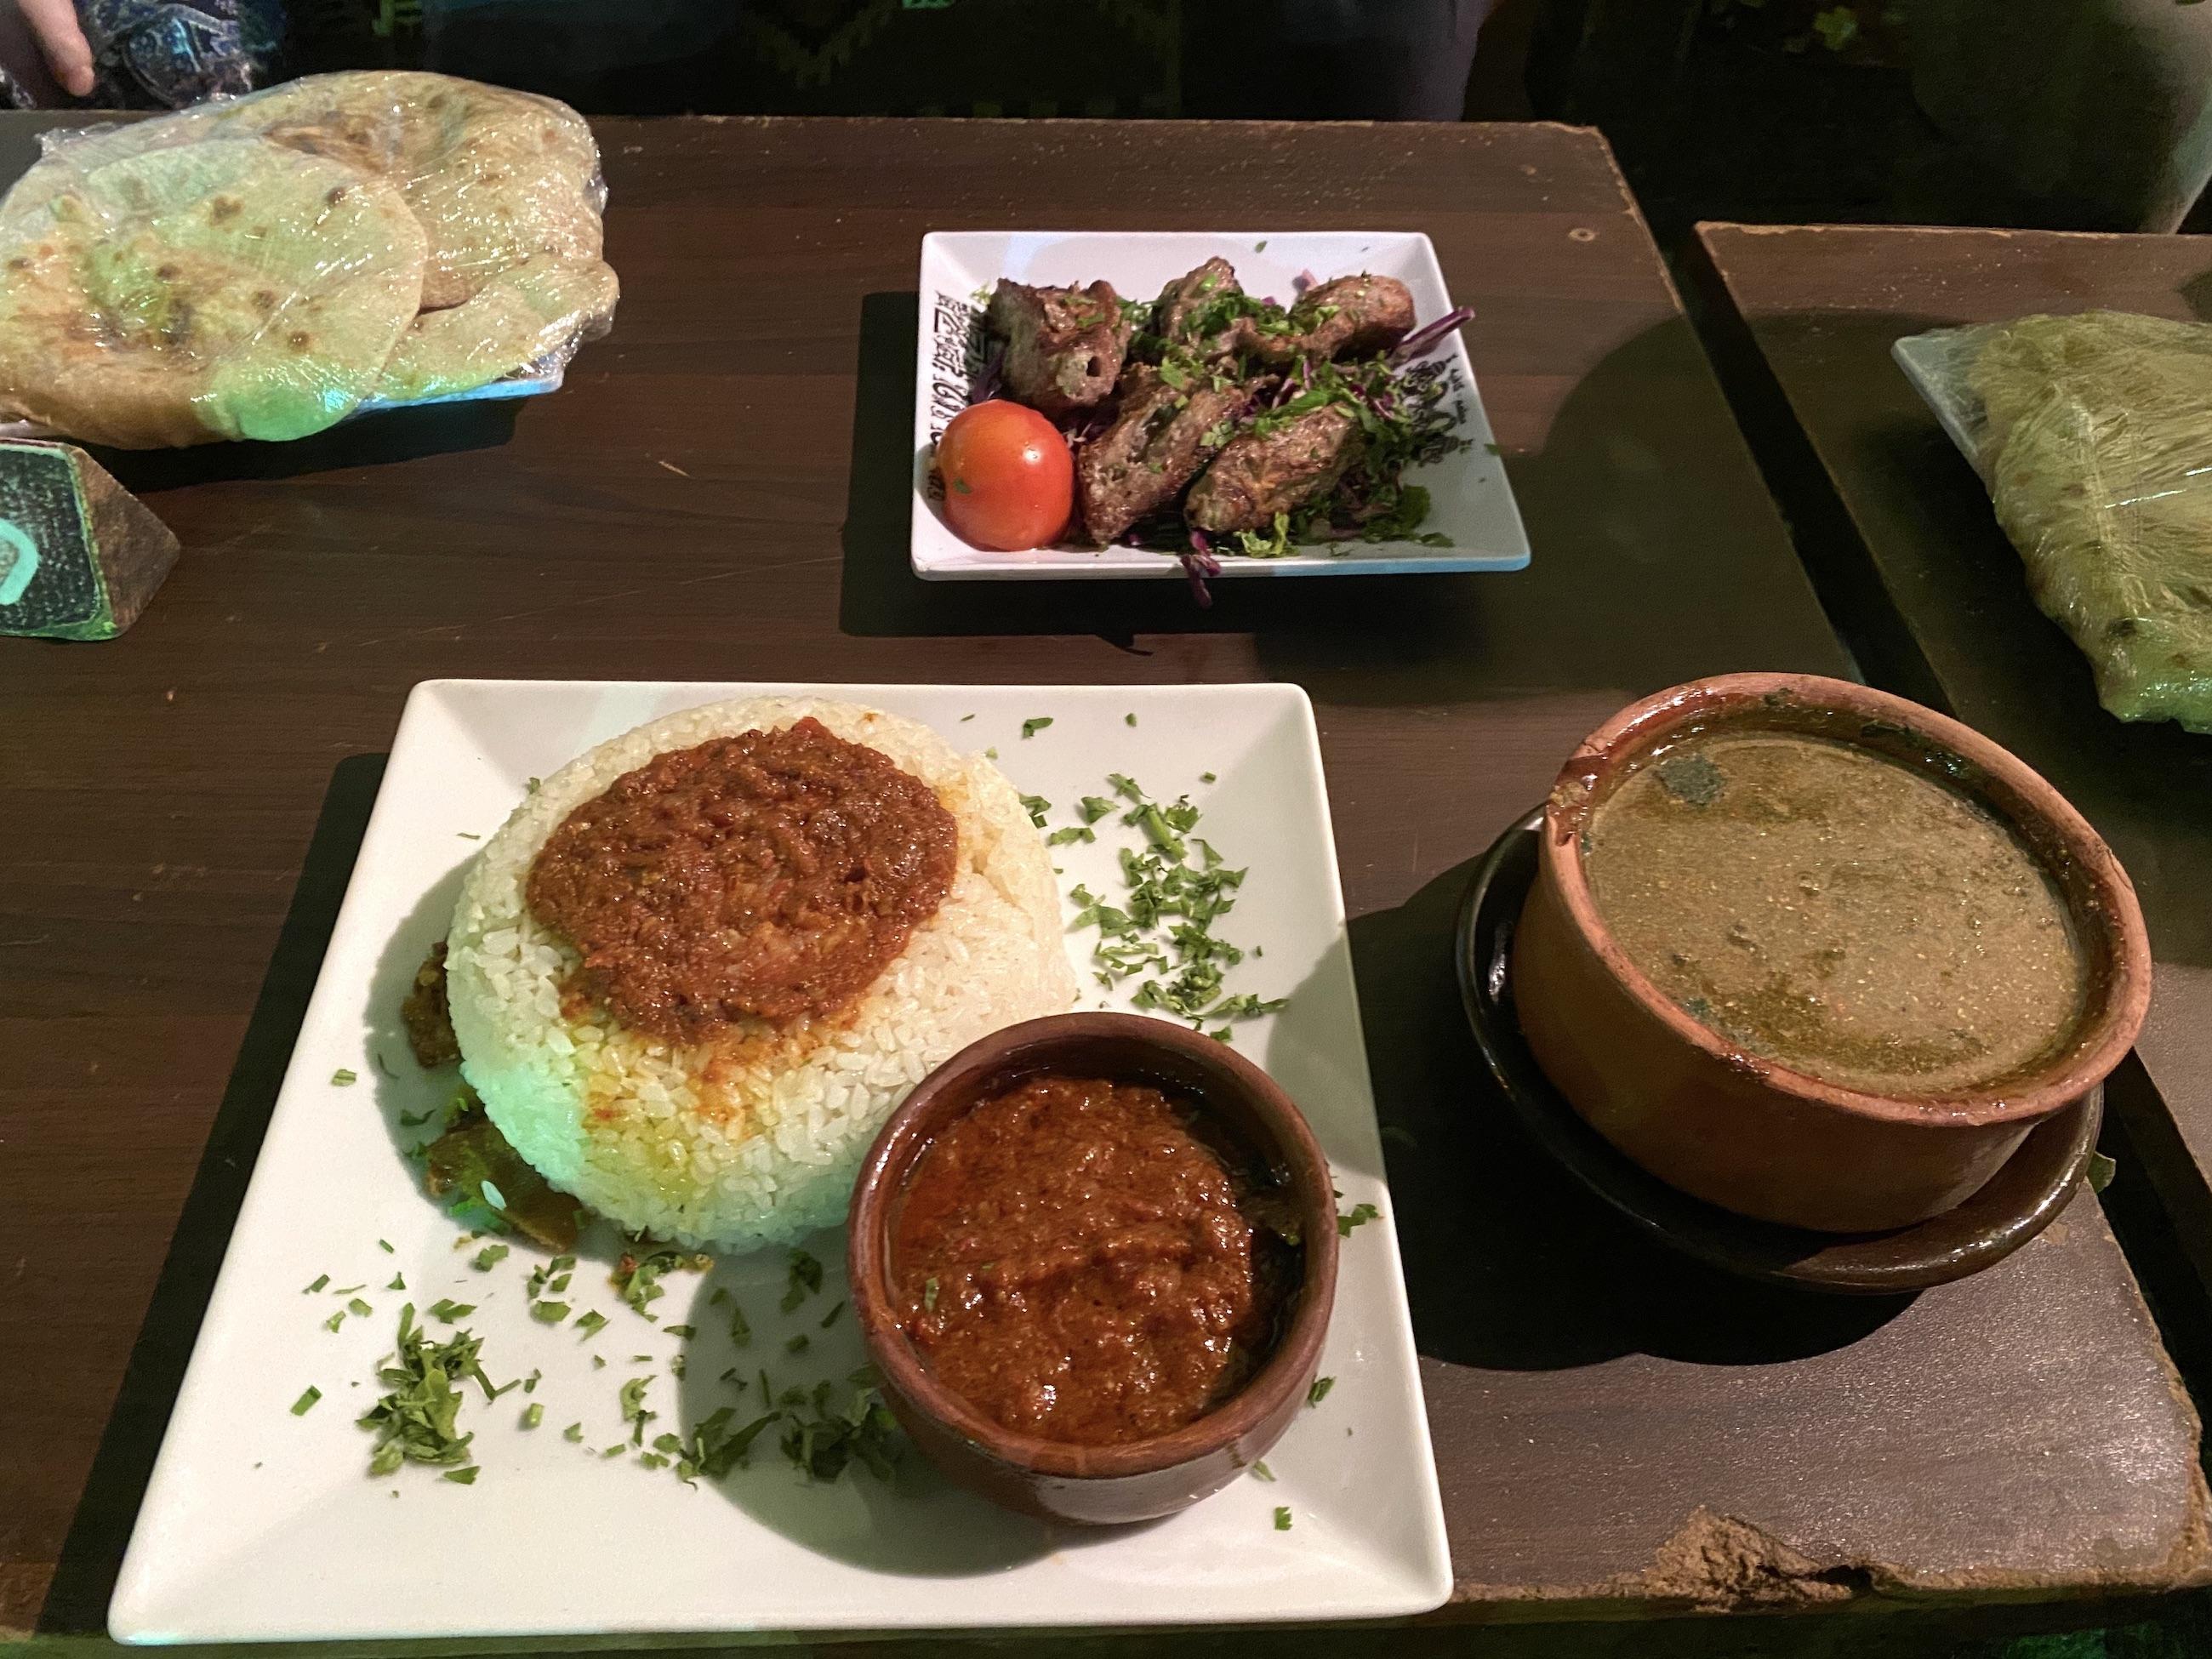 https://bubo.sk/uploads/galleries/17820/gstro-jedlo-na-stole-kahira.jpg